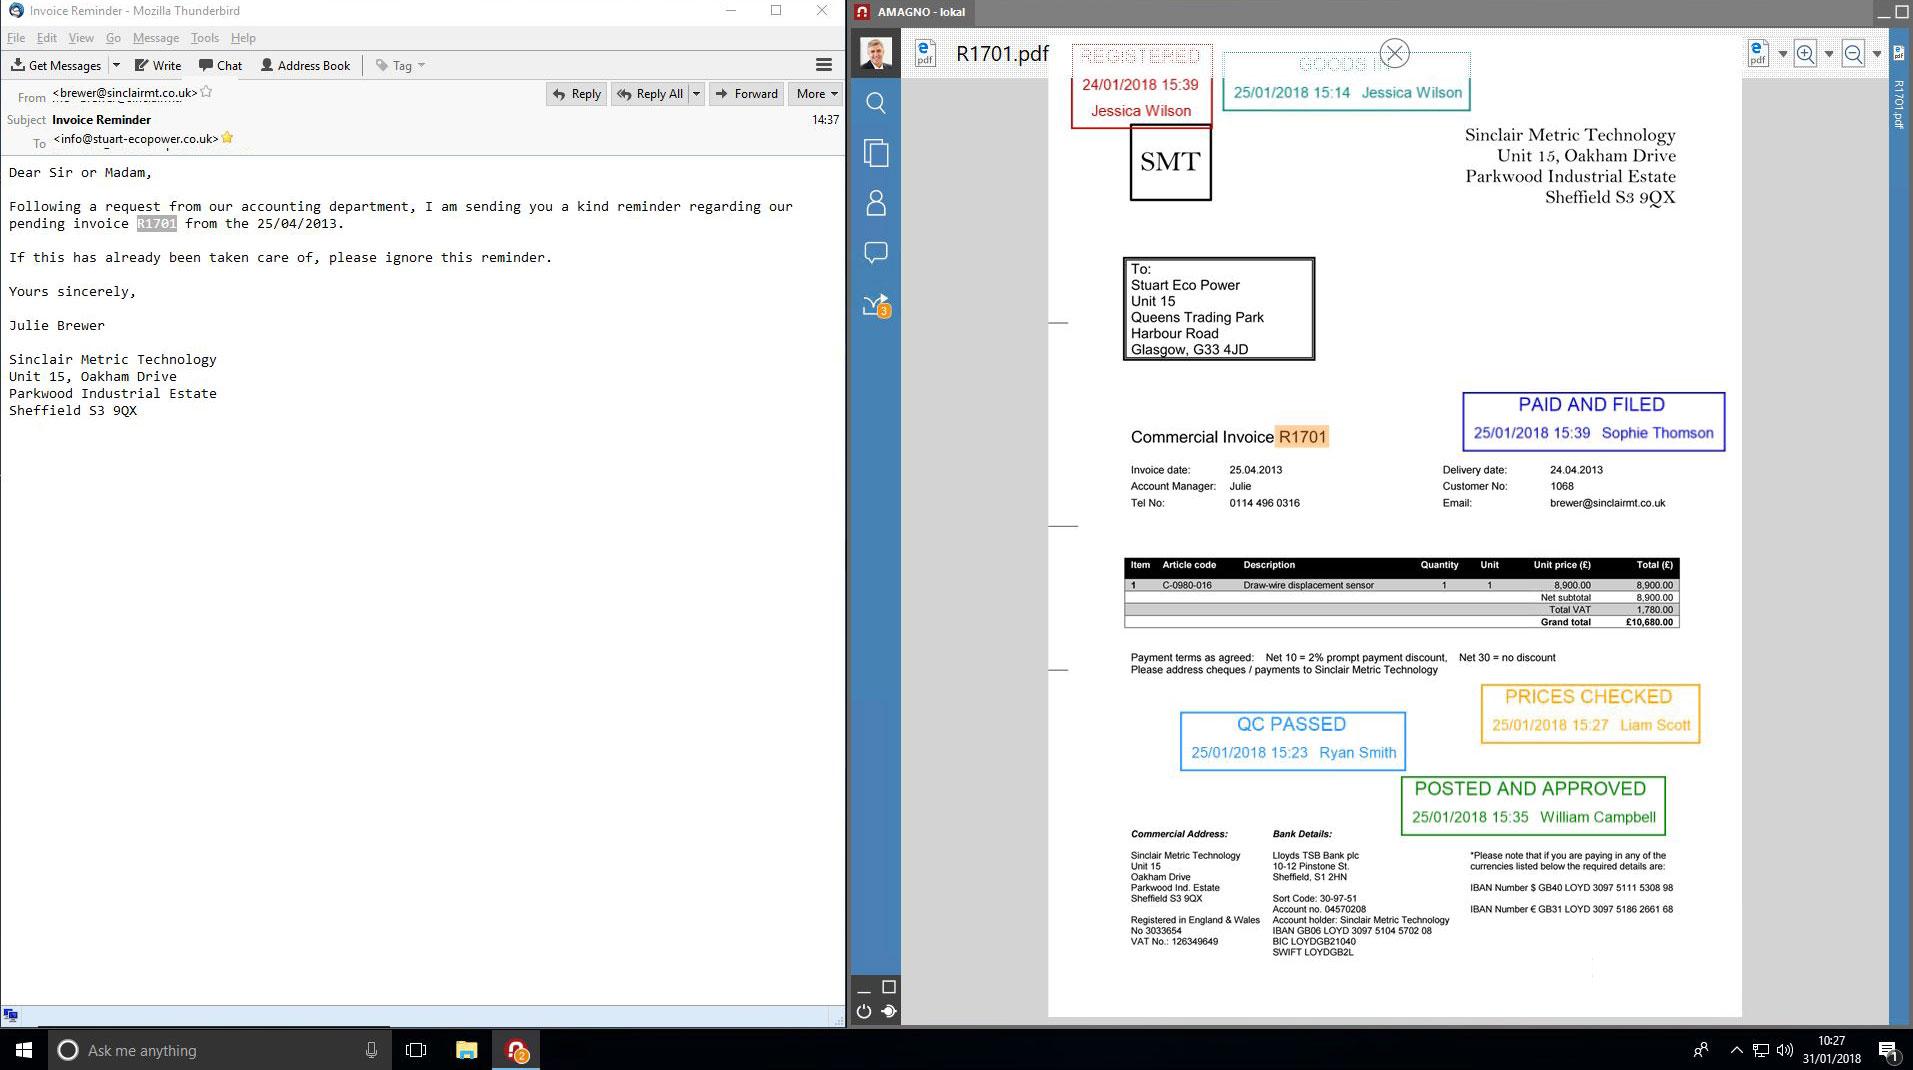 AMAGNO 5 Side by Side en - Email Archiving